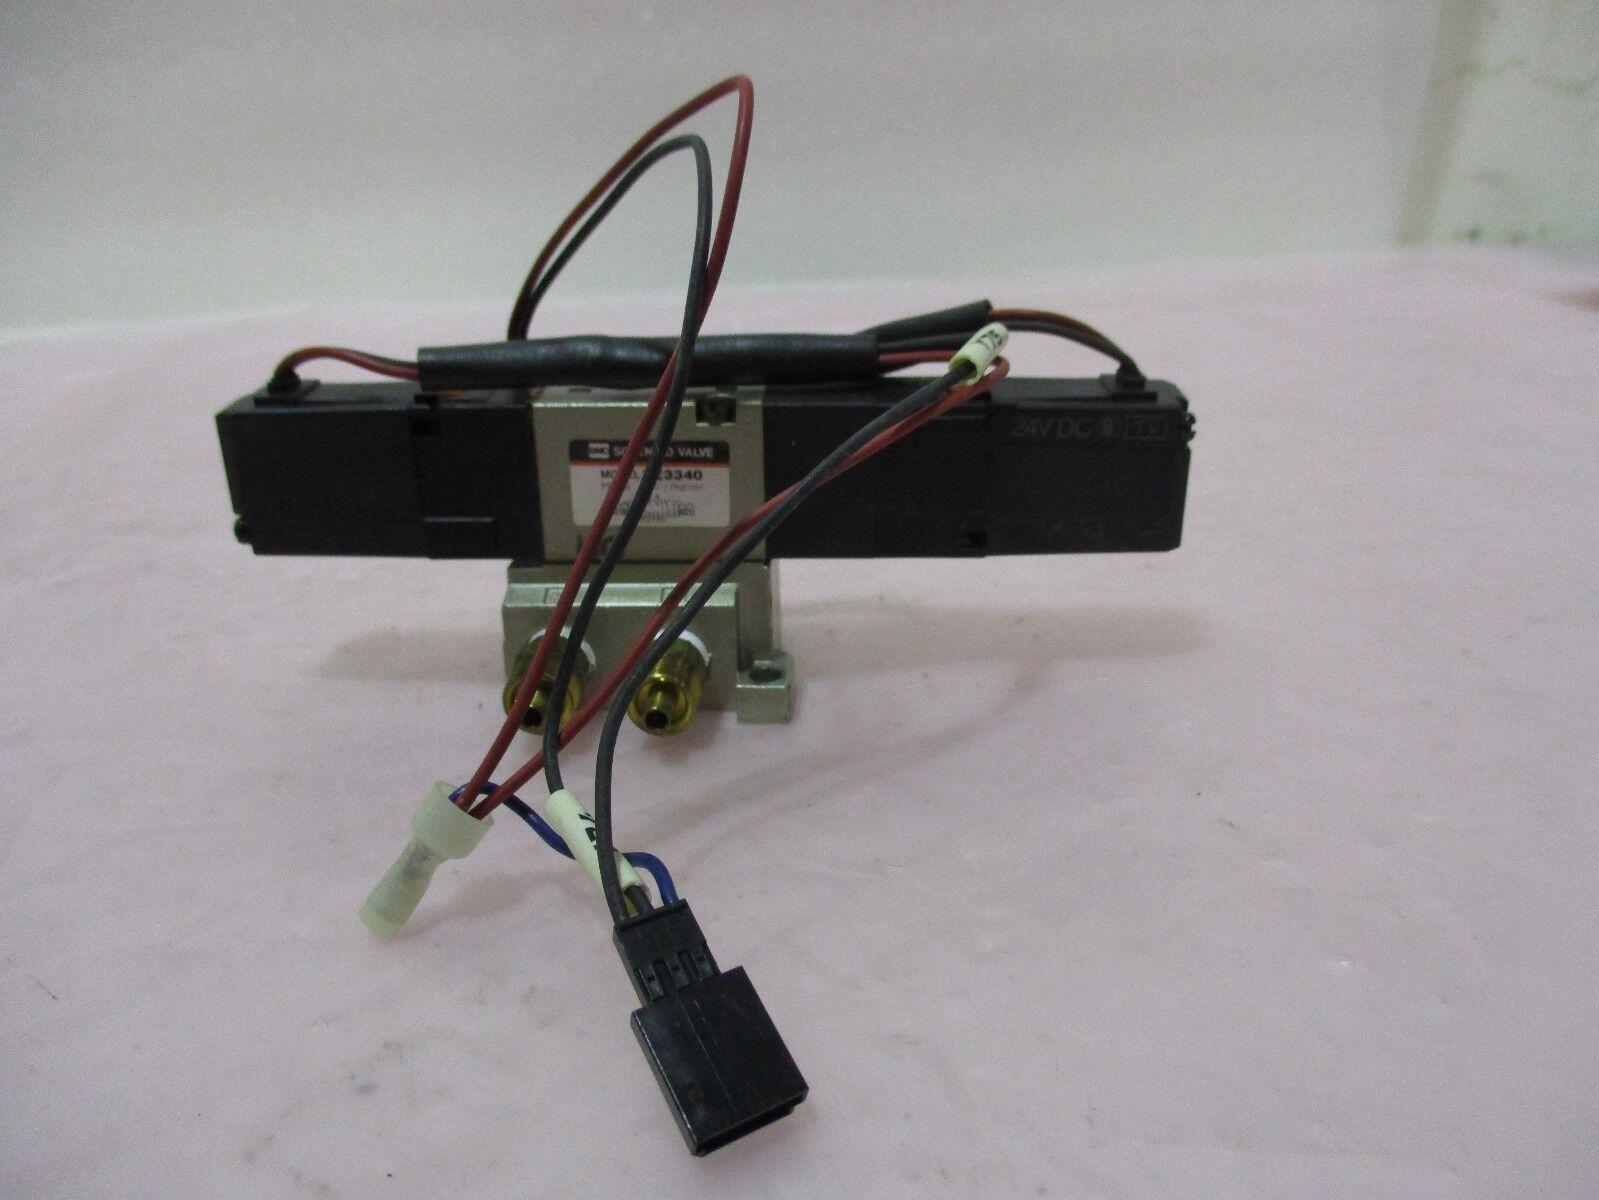 SMC VZ3340 Solenoid Valve Assembly, 420394